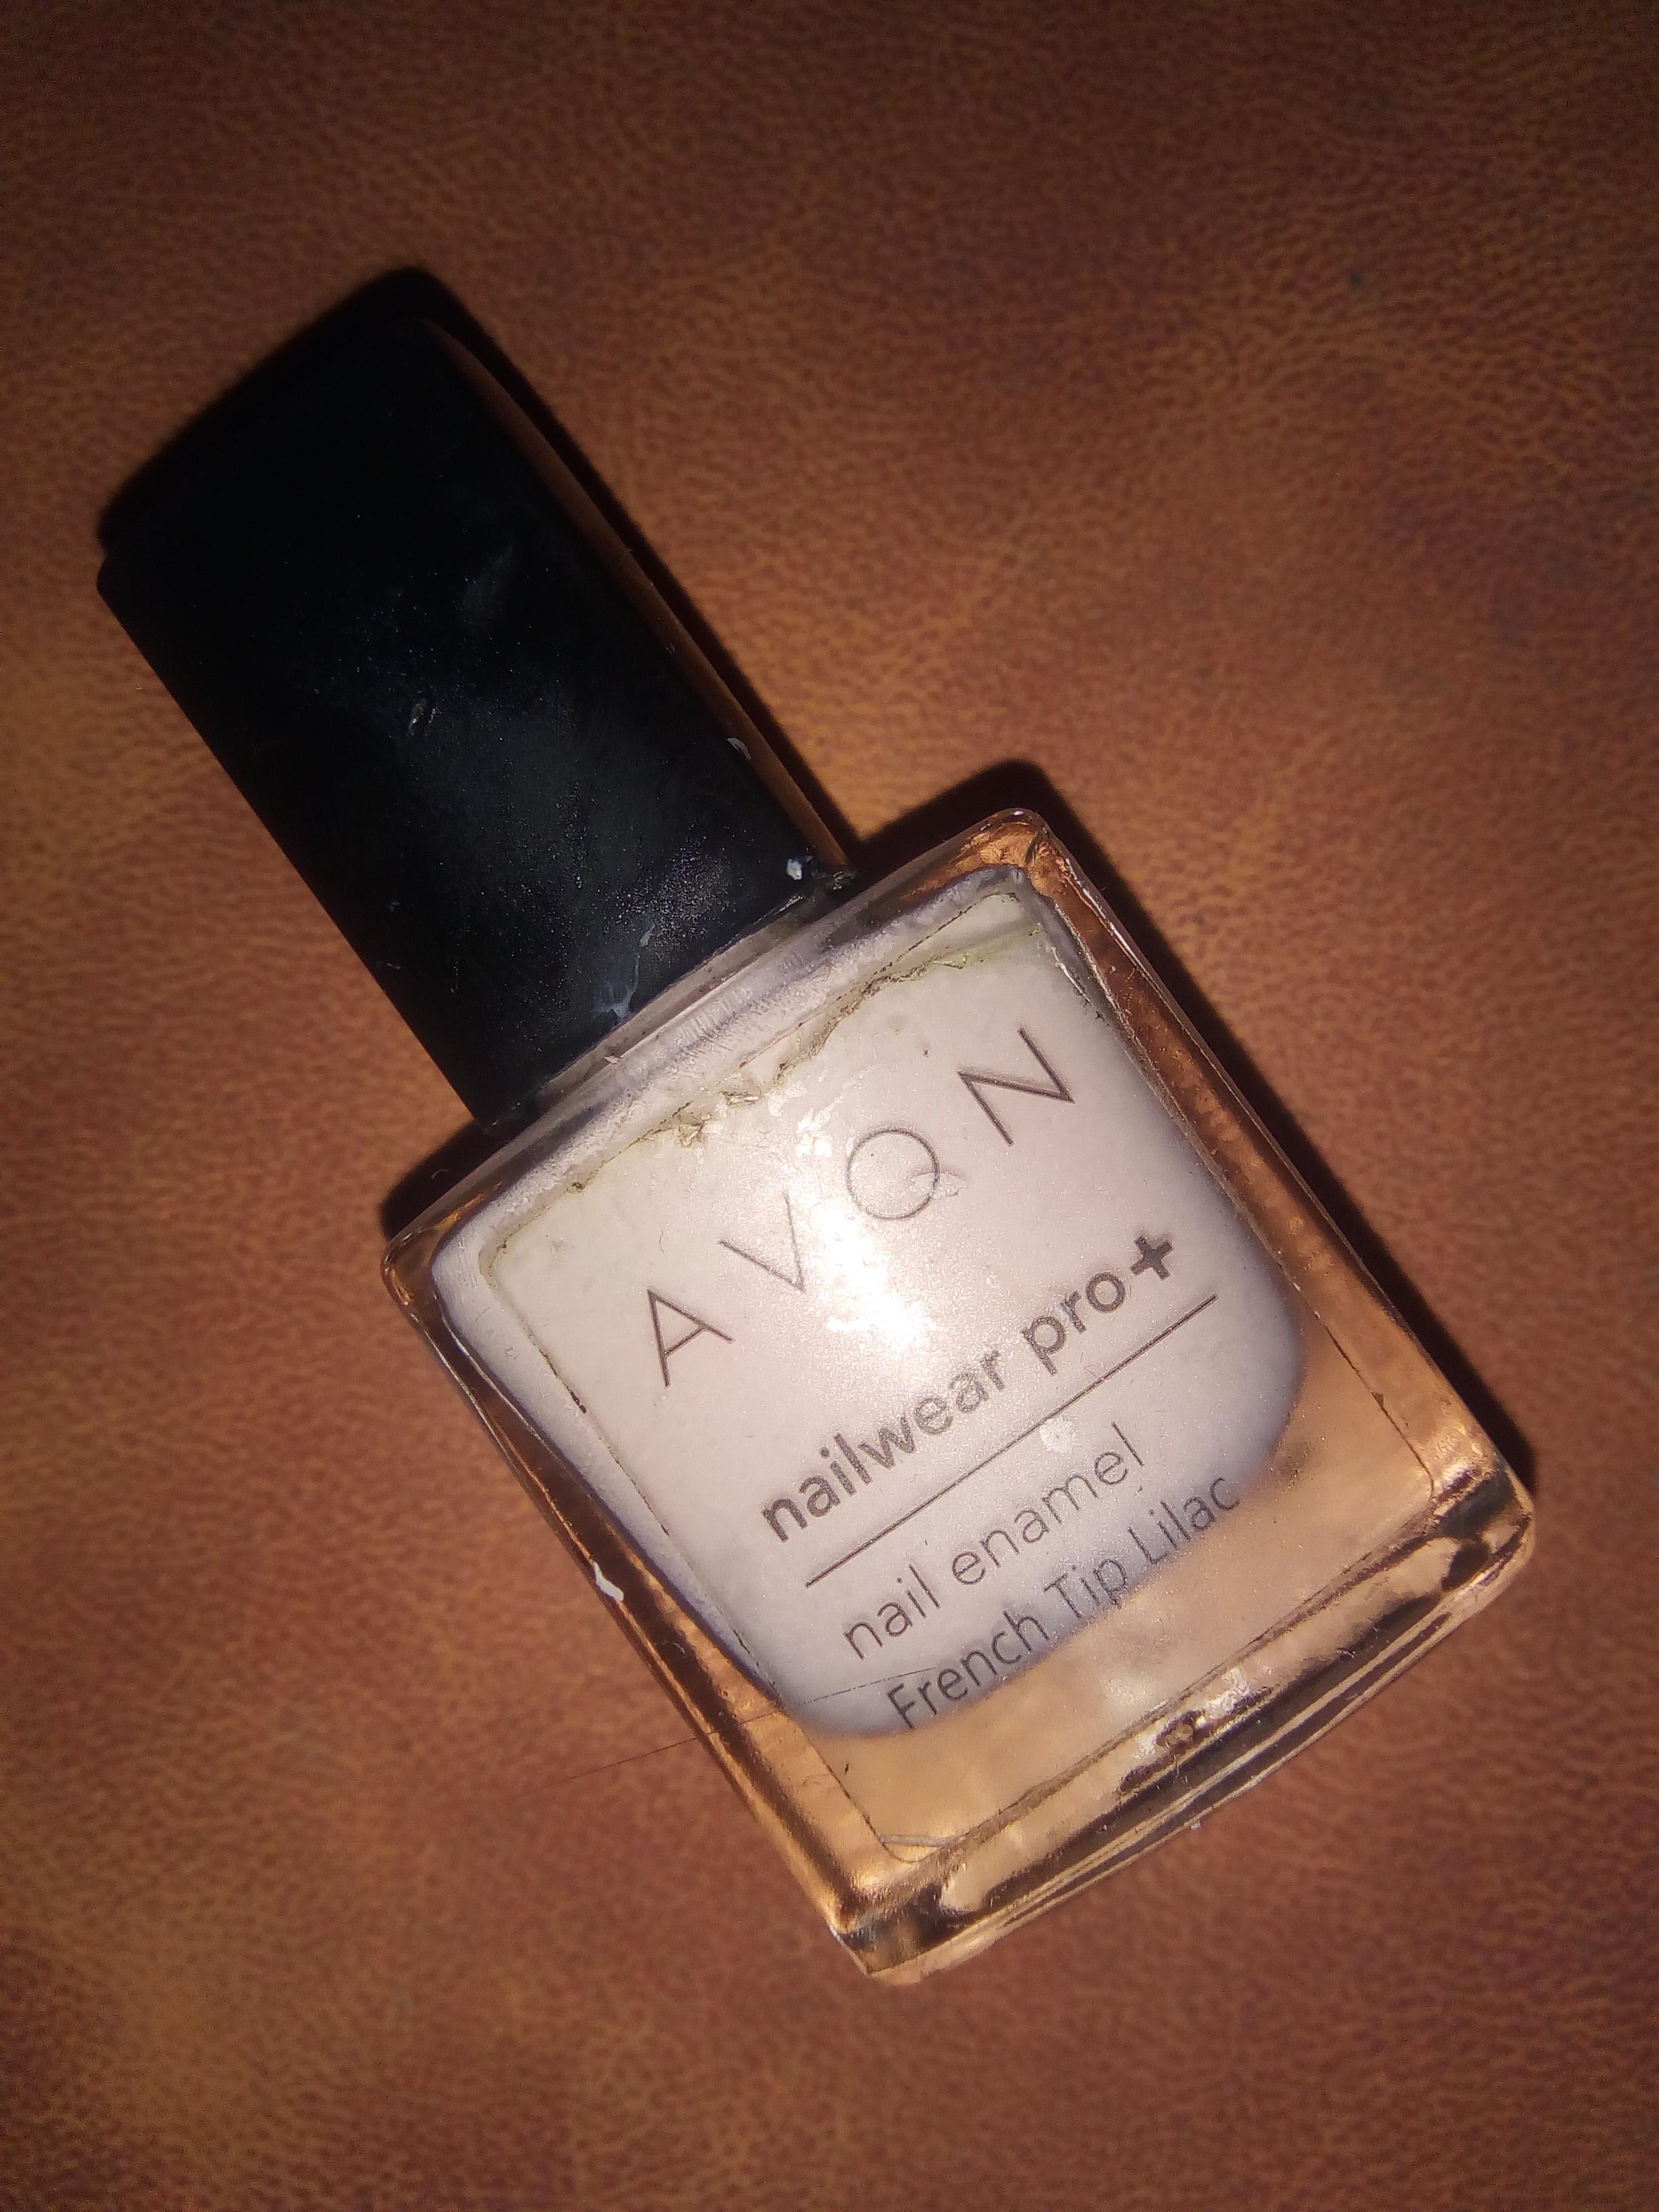 Avon True Color Pro+ Nail Enamel pic 1-Avon True Color Pro Nail Enamel-By aflyingsoul